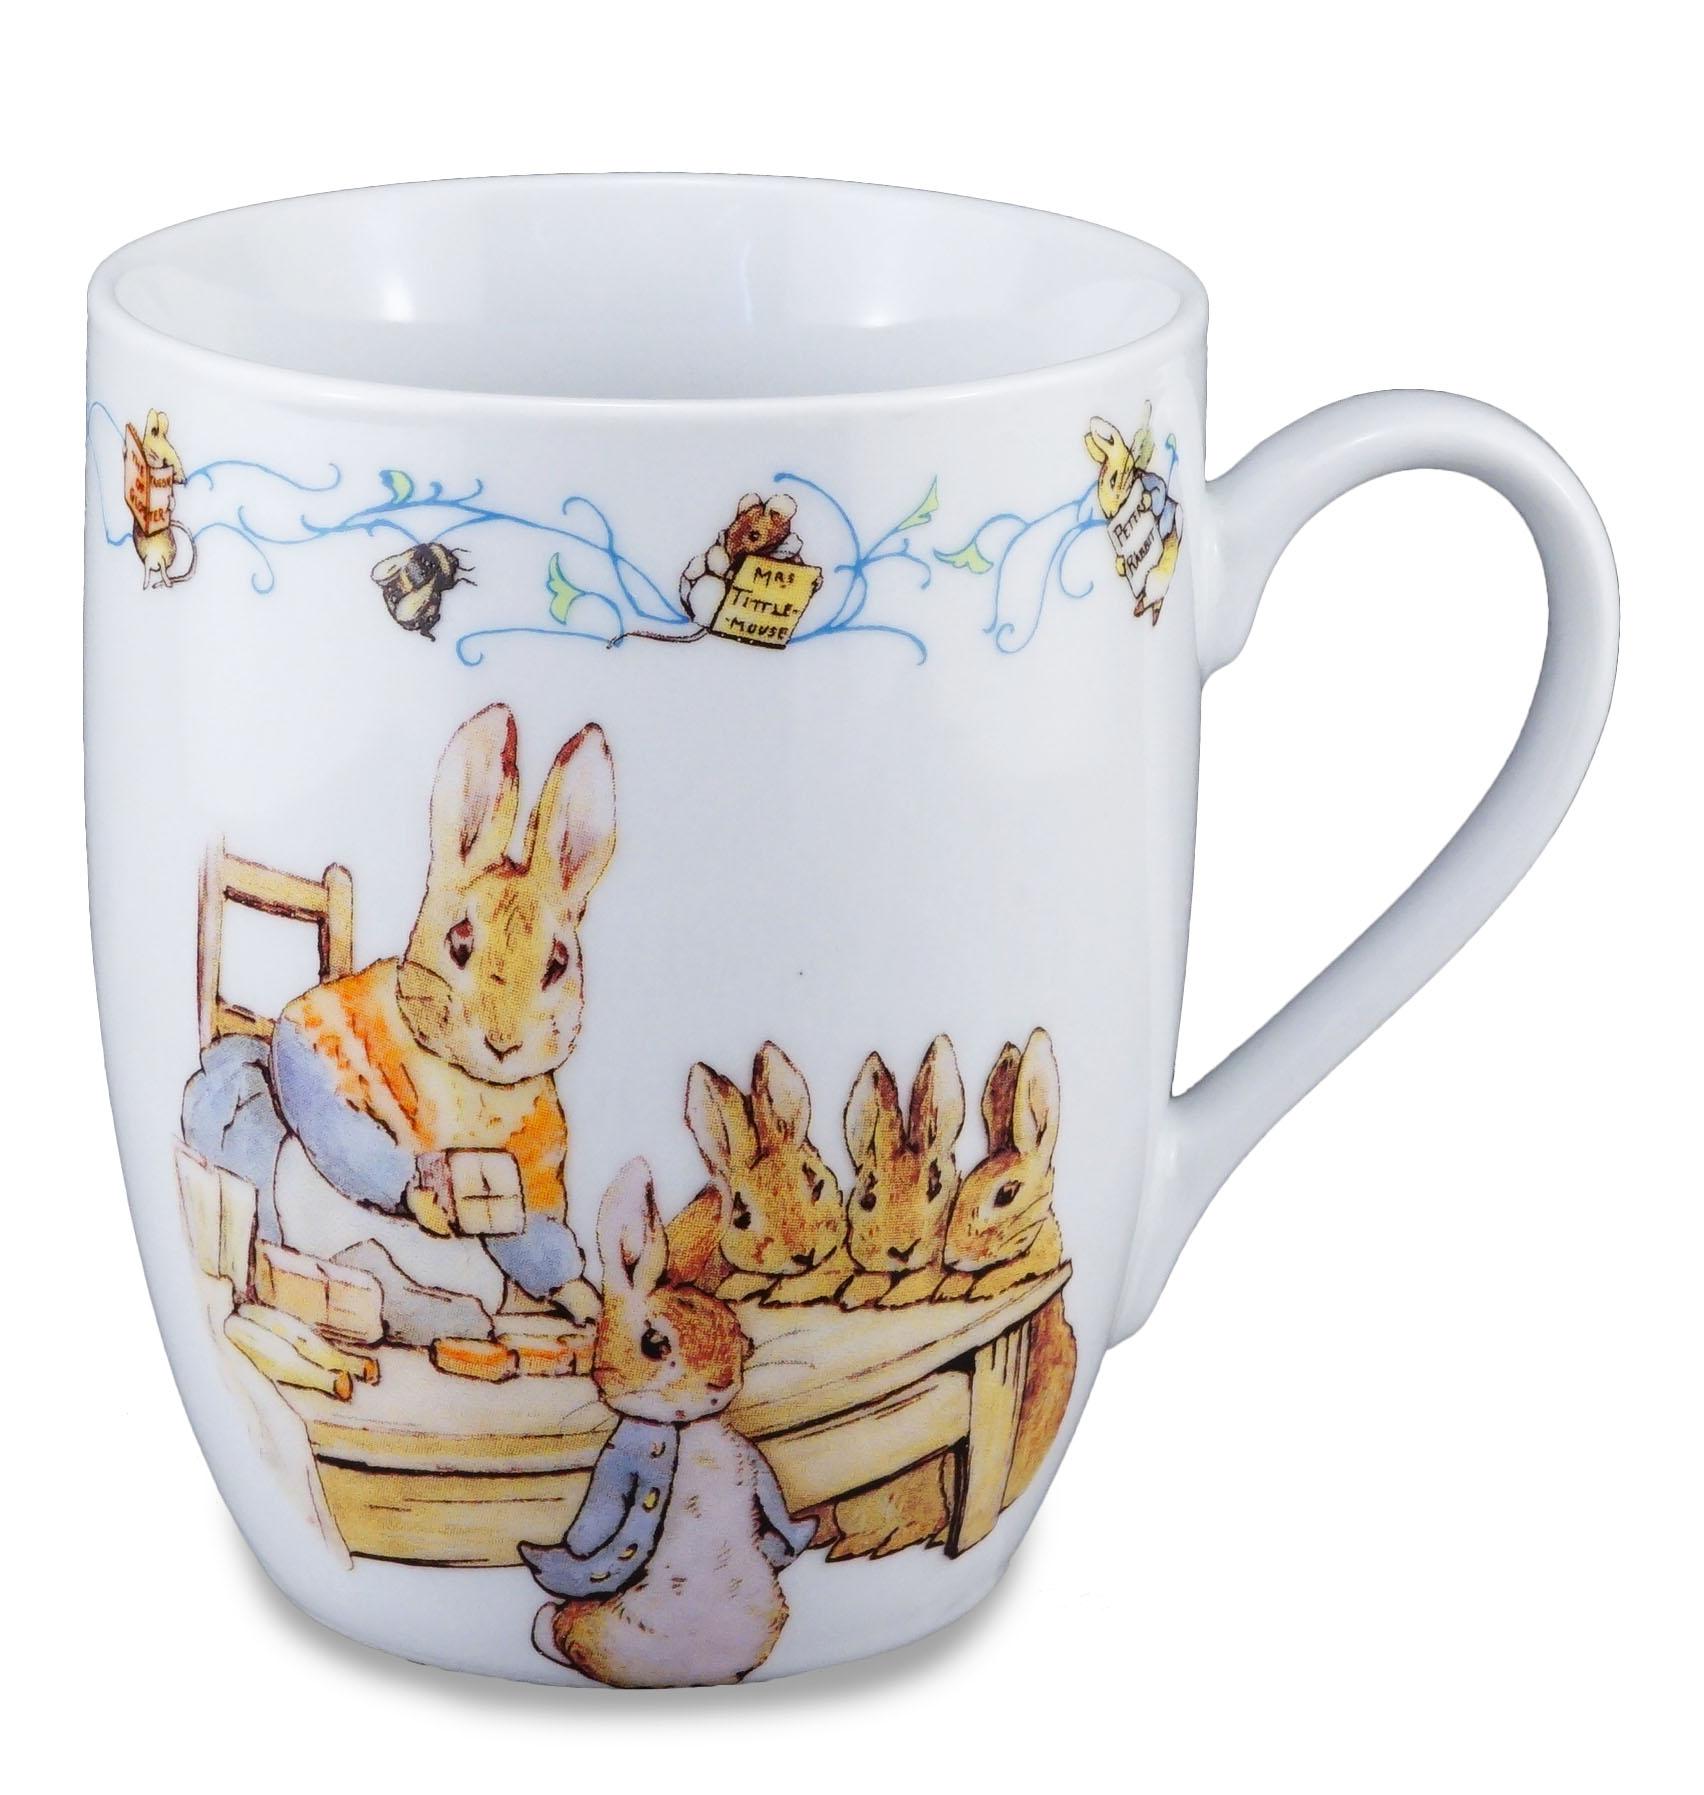 150th Jubilum Peter Rabbit Amp Family Porzellan Tasse